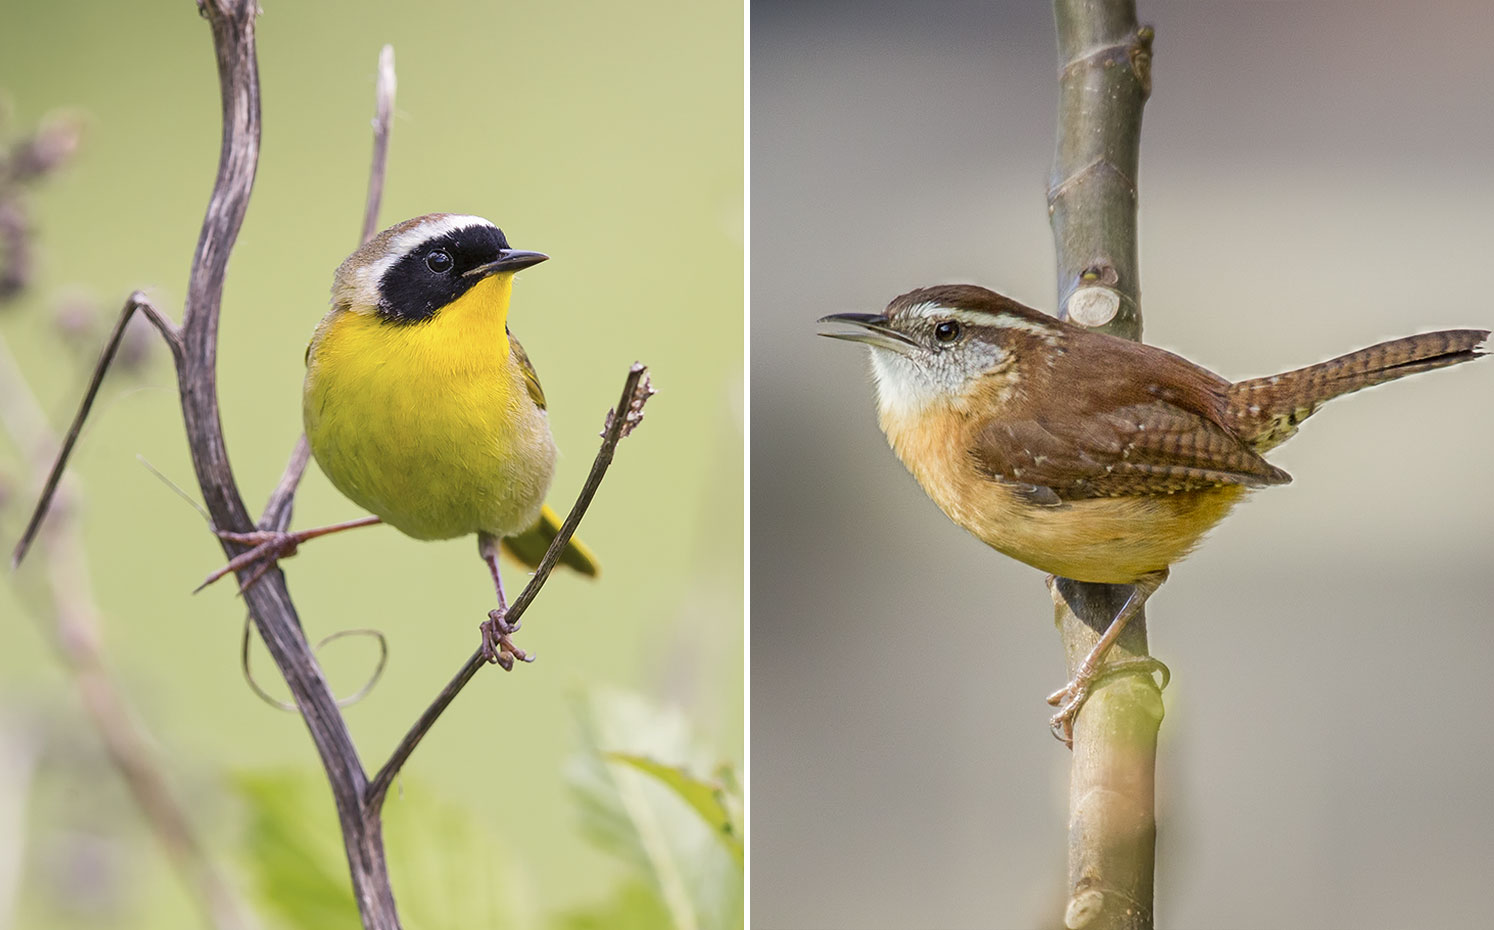 From left: Common Yellowthroat. Photo: Boe Baty/Audubon Photography Awards; Carolina Wren. Photo: Mike Smeets/Great Backyard Bird Count